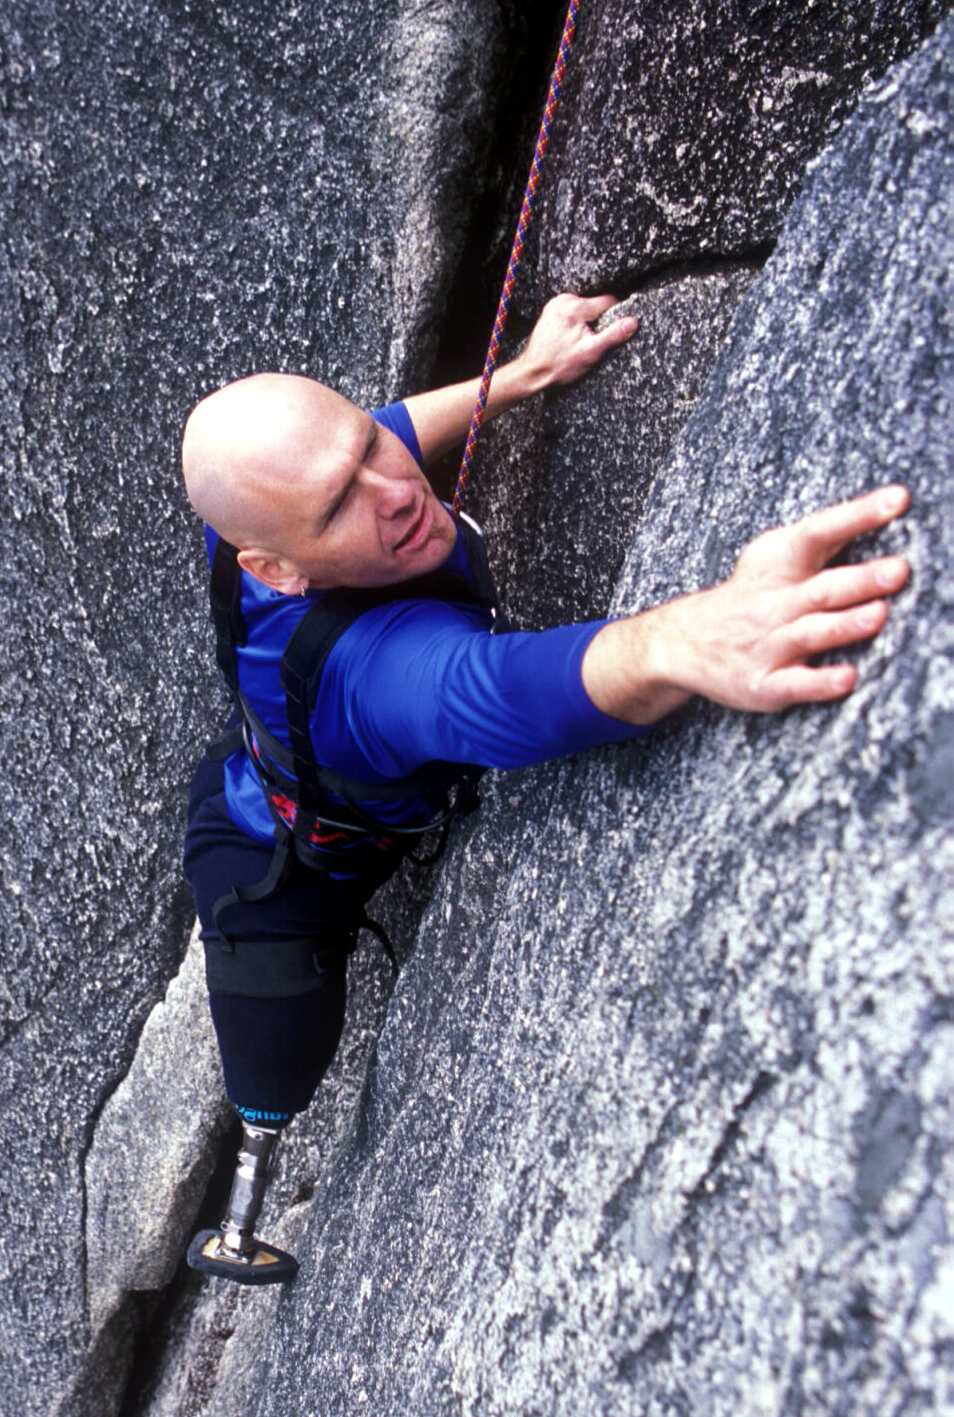 Warren Macdonald, climbing portrait (1.3 MB)